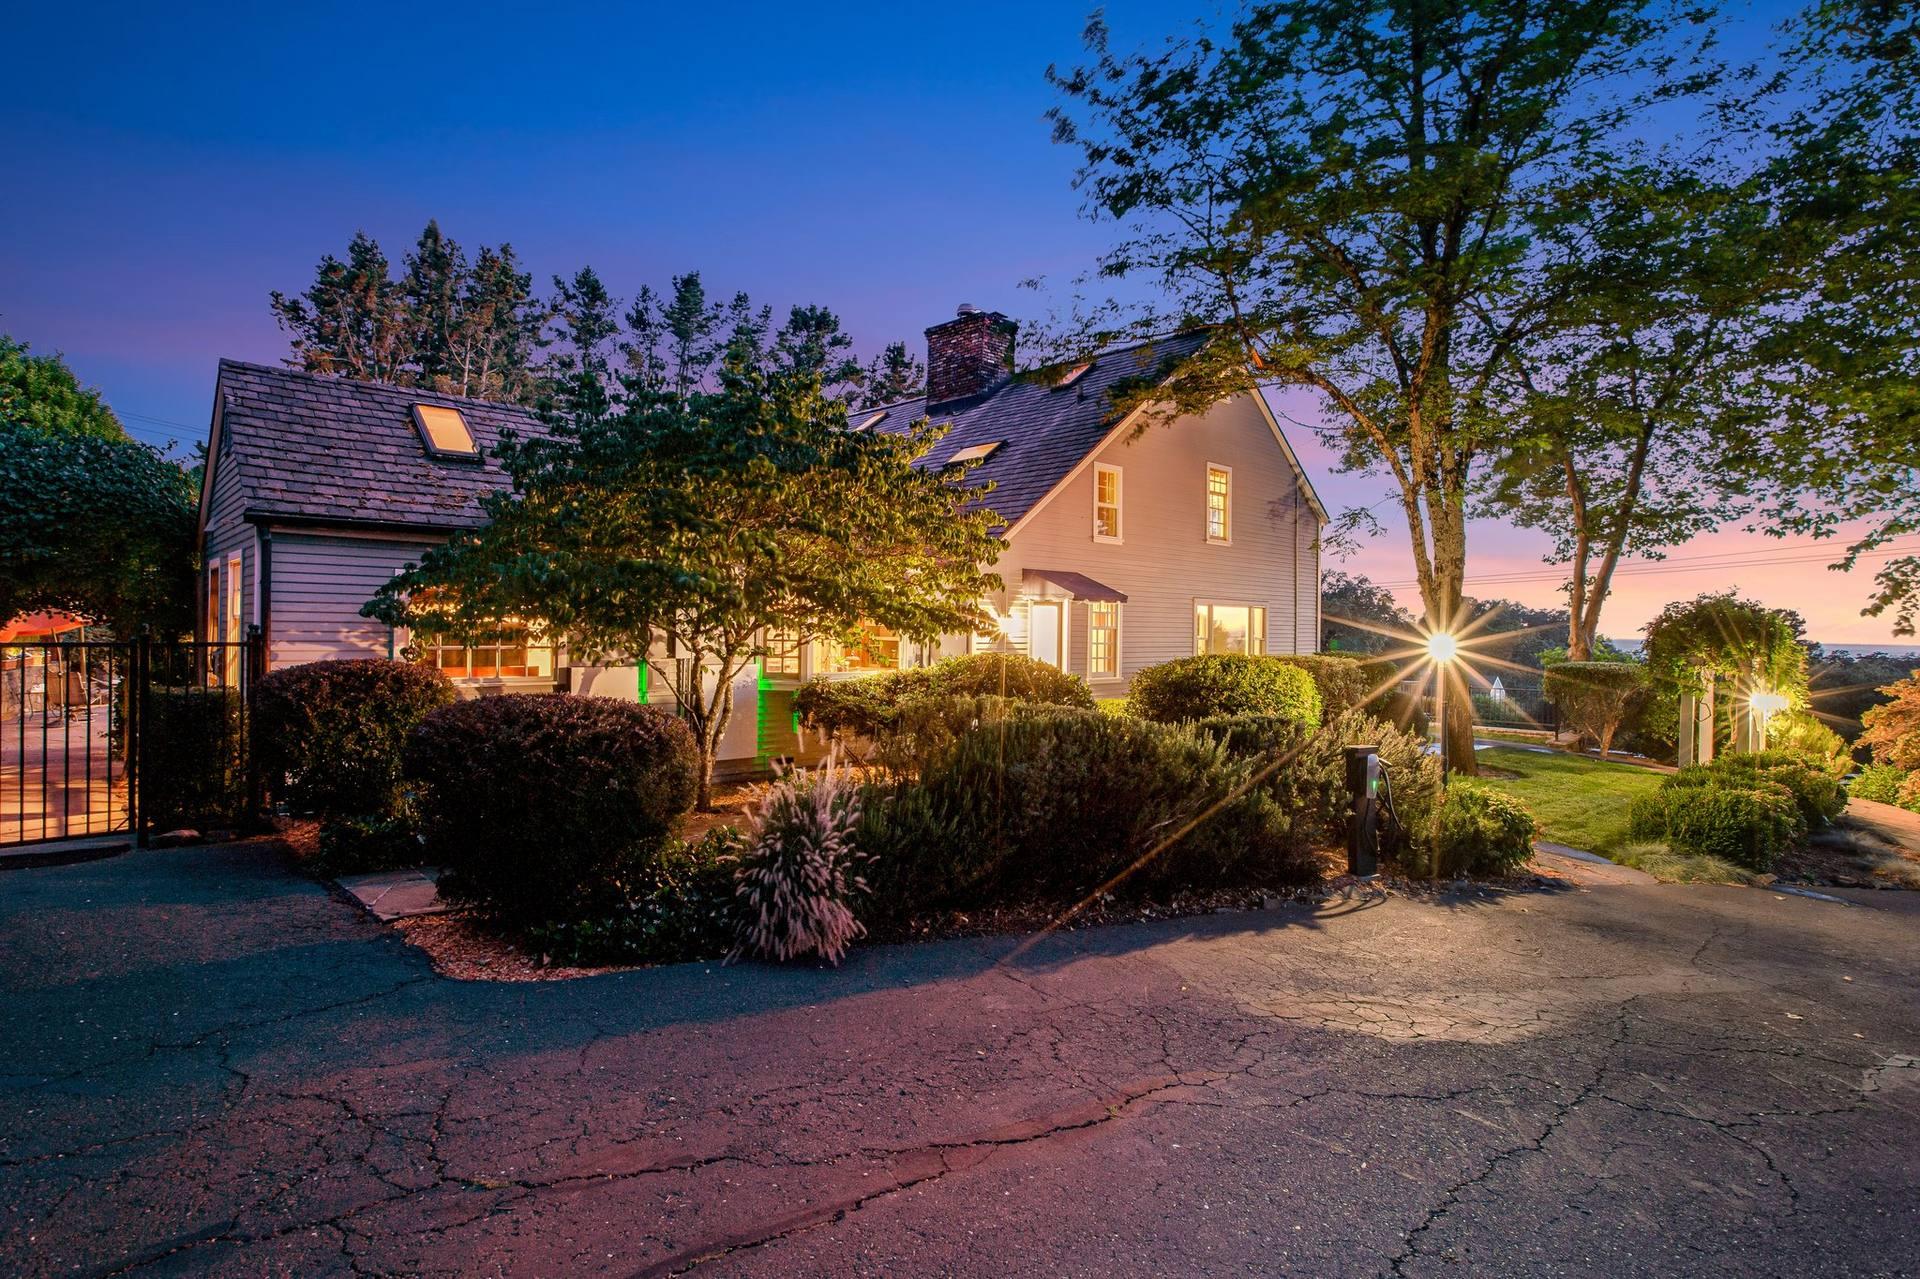 6650 Eagle Ridge Rd, Penngrove, CA 94951, USA